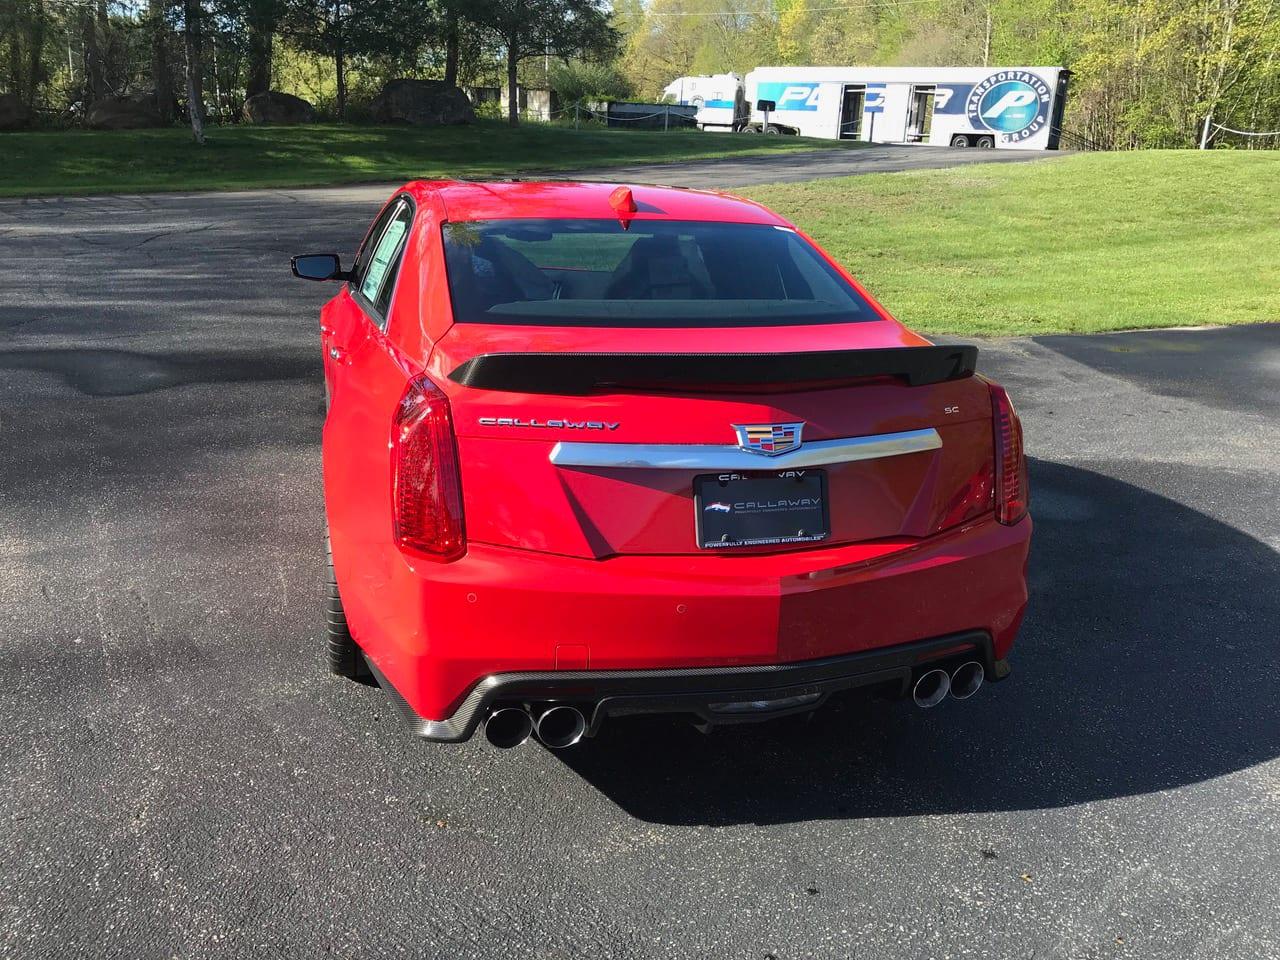 2019 Callaway CTS-V SC740 - rear view